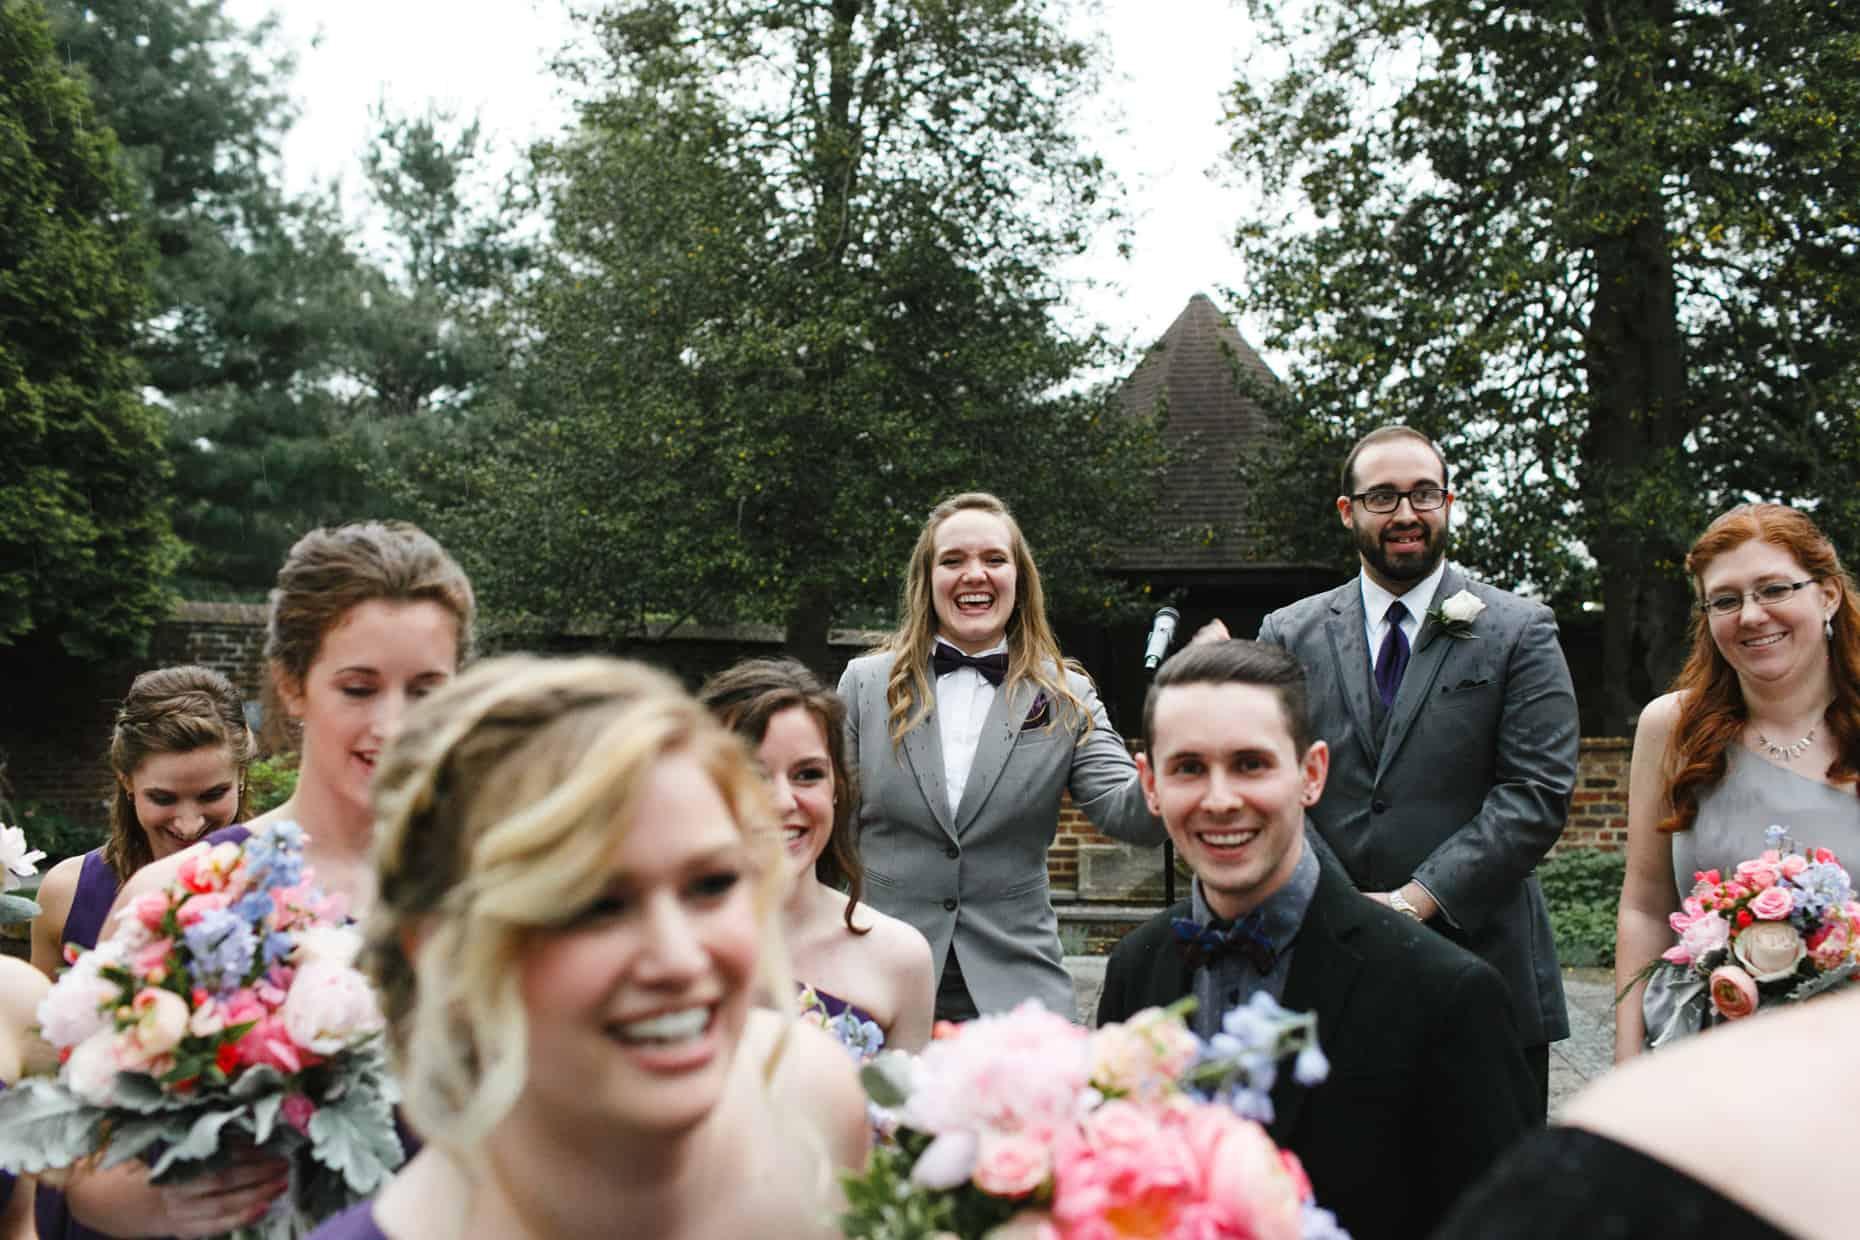 Bucks County Mansion Wedding Photos